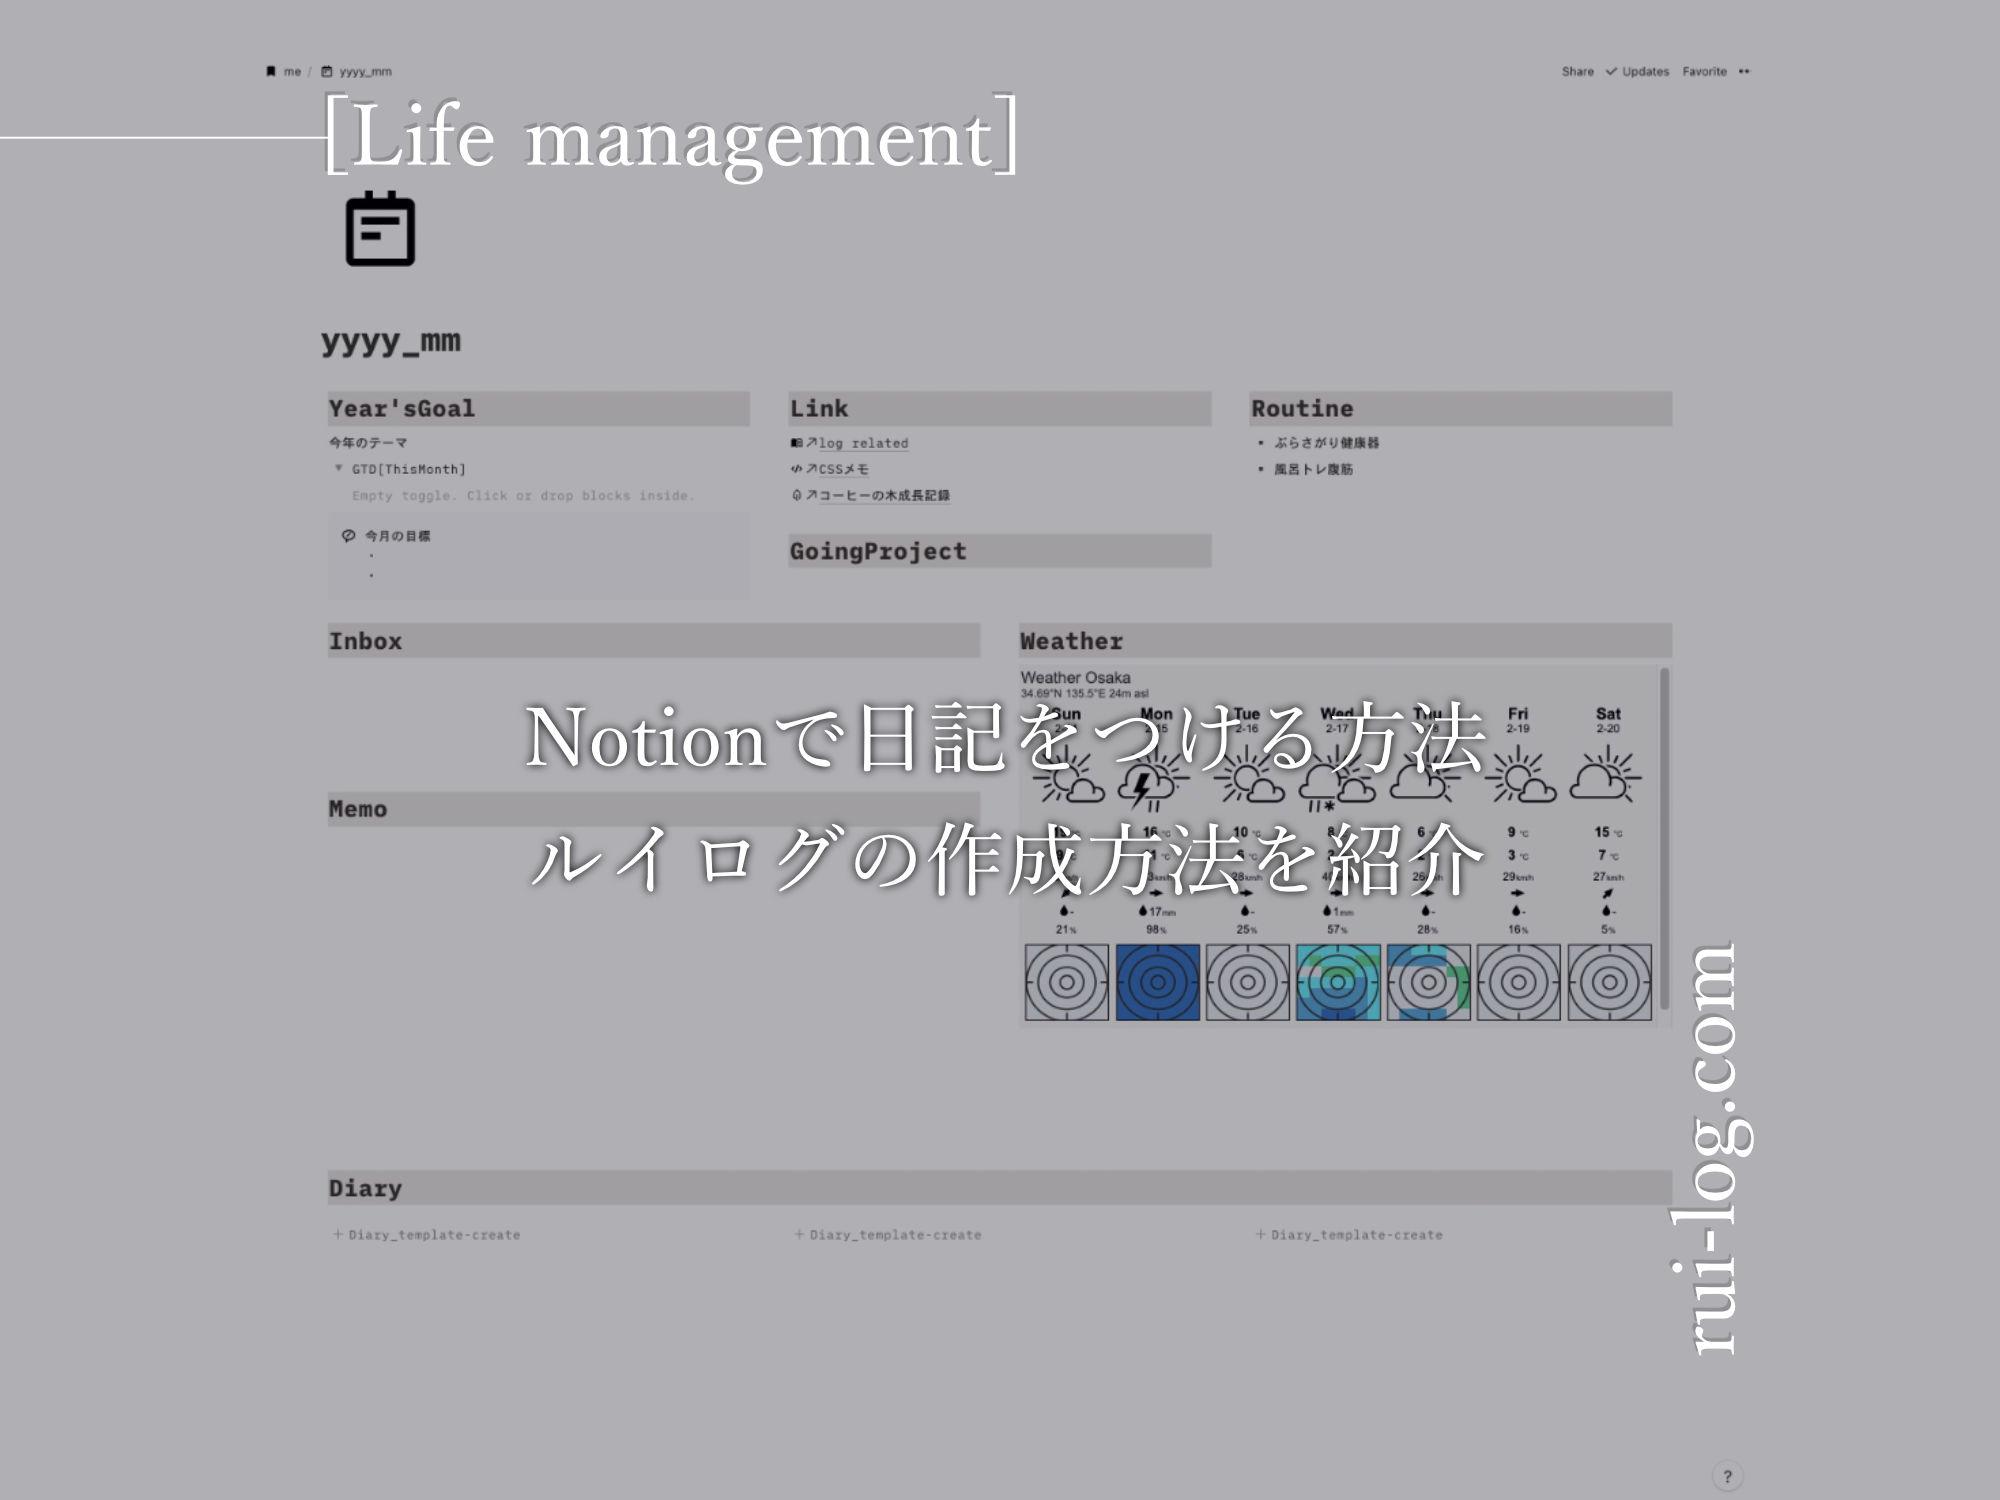 Notionで日記をつける方法。ルイログの作成方法を紹介。